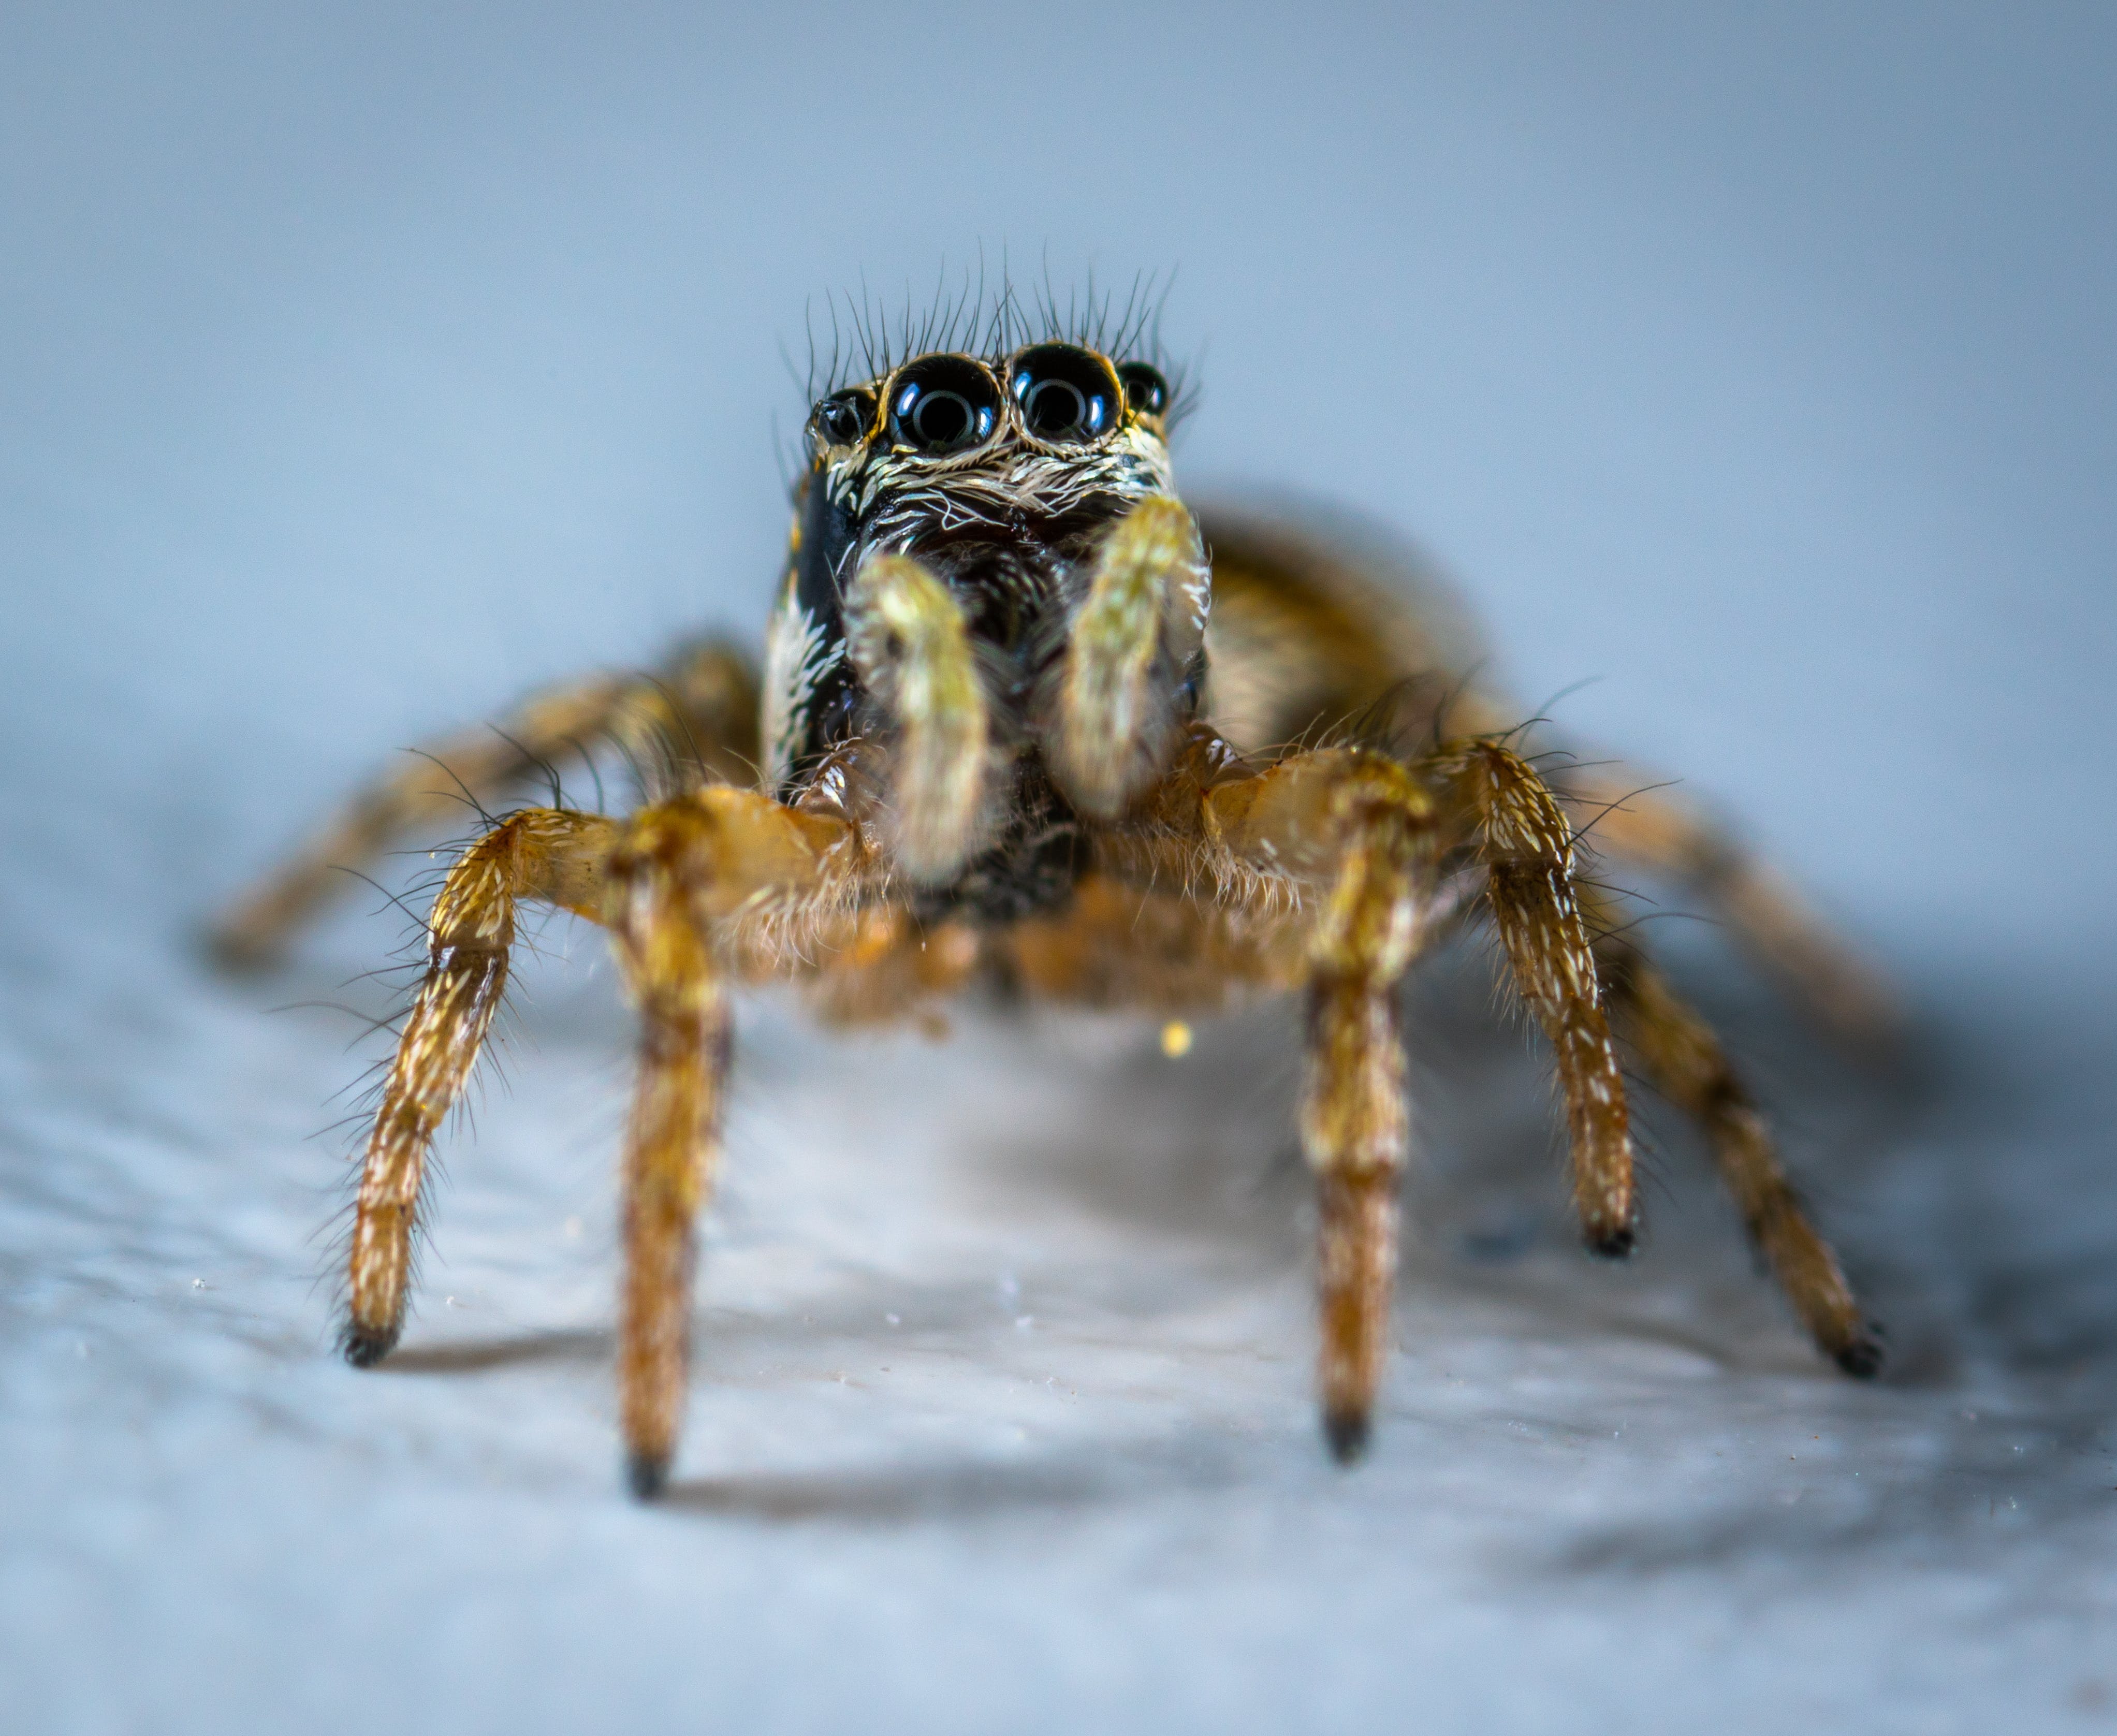 Spider Macro Photography